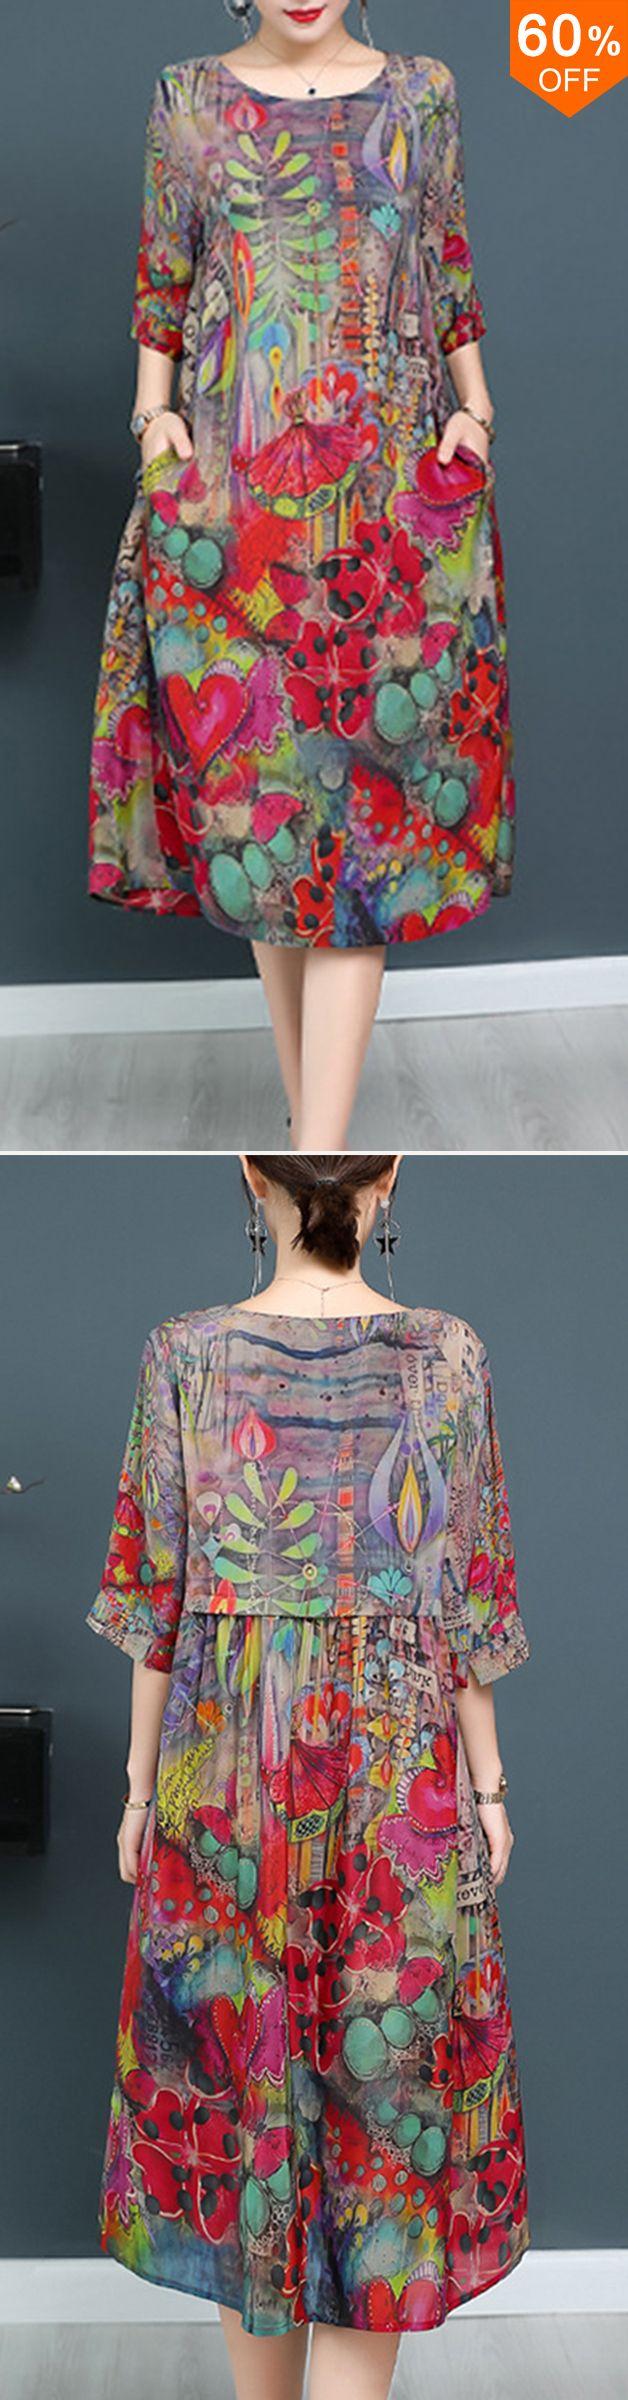 60% off&Free shipping. Plus Size Elegant Art Print Loose Dress For Women.I love ... 1